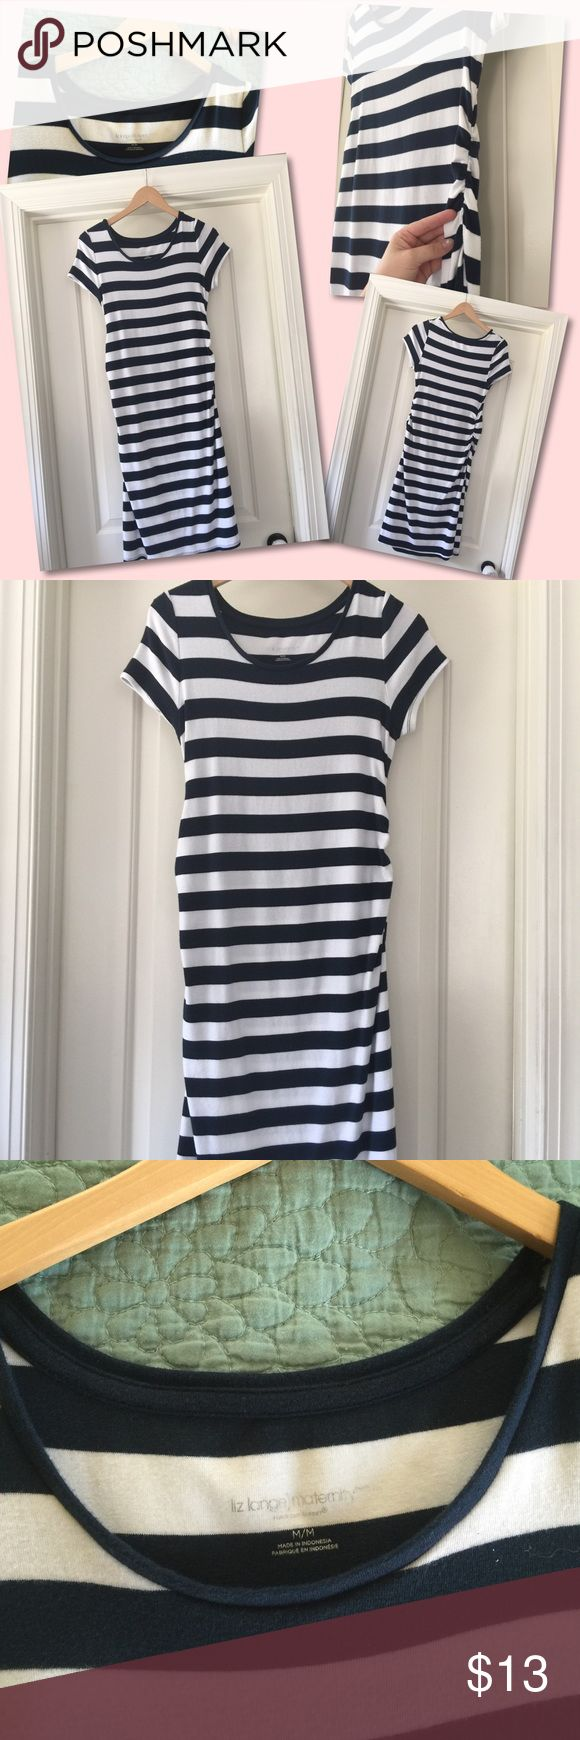 Women's maternity blue and white striped dress Women's maternity blue and white striped dress. liz lange maternity Dresses